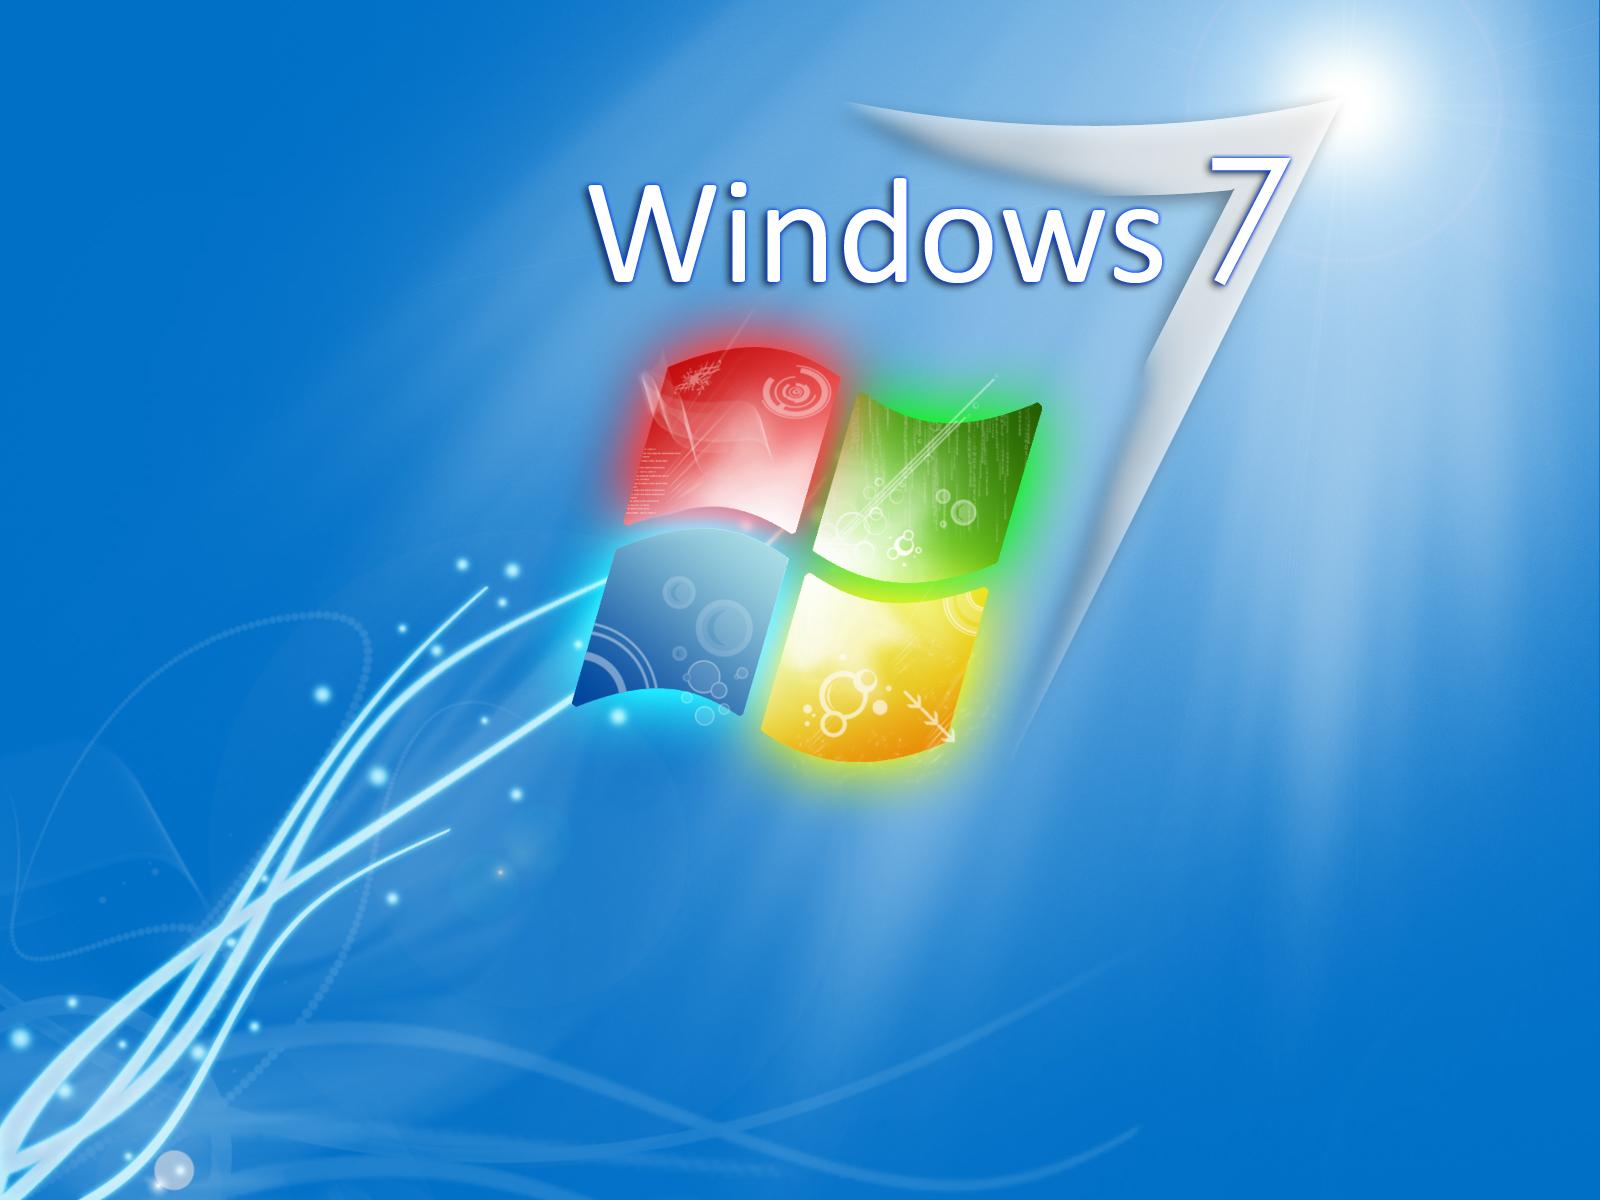 Wallpaper: Wallpaper Hd Desktop Windows 7